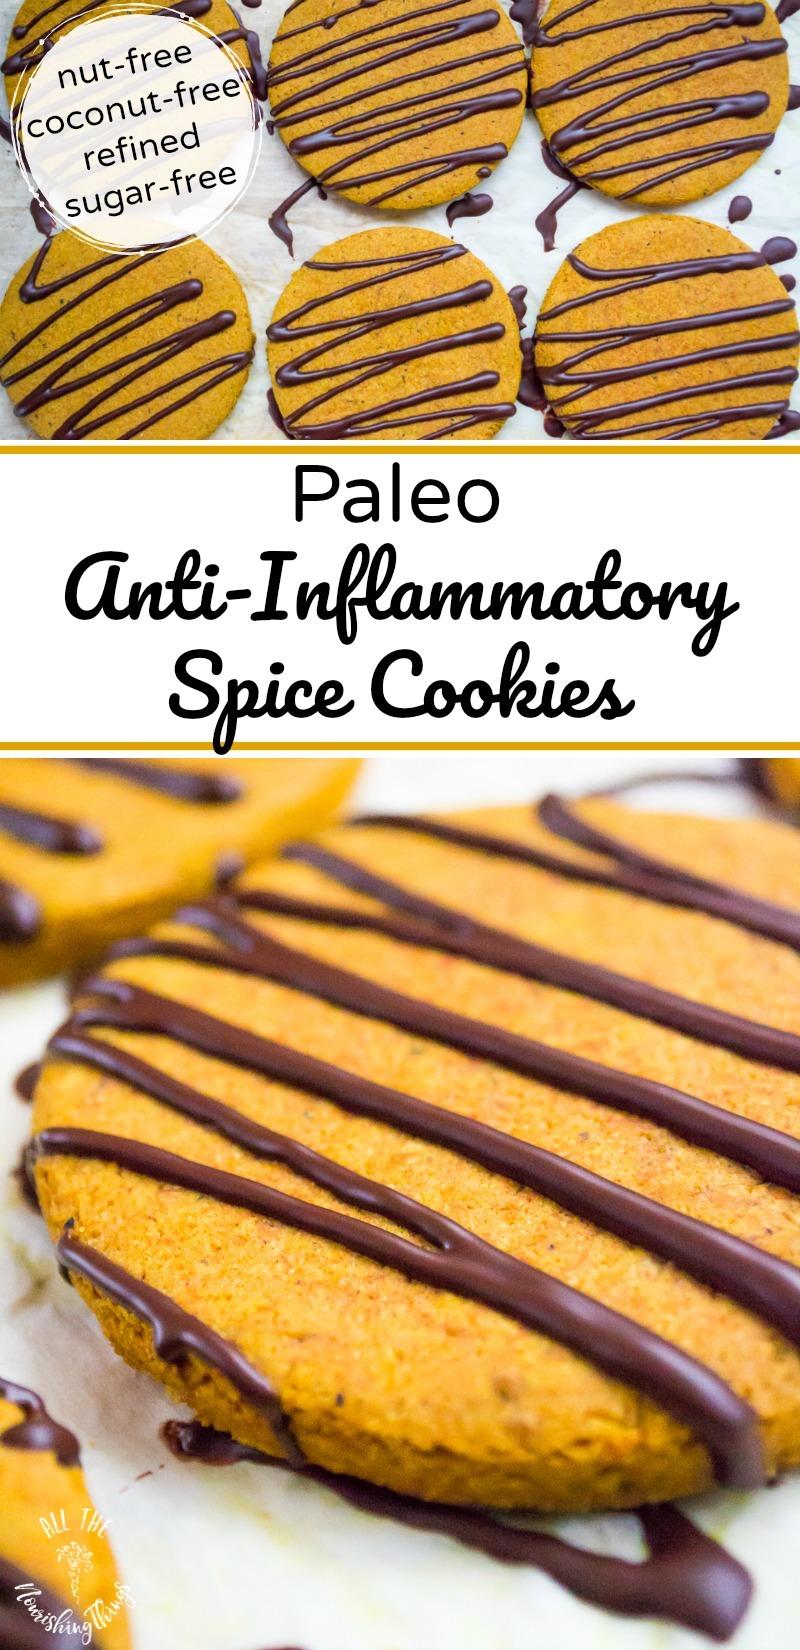 paleo anti-inflammatory spice cookies